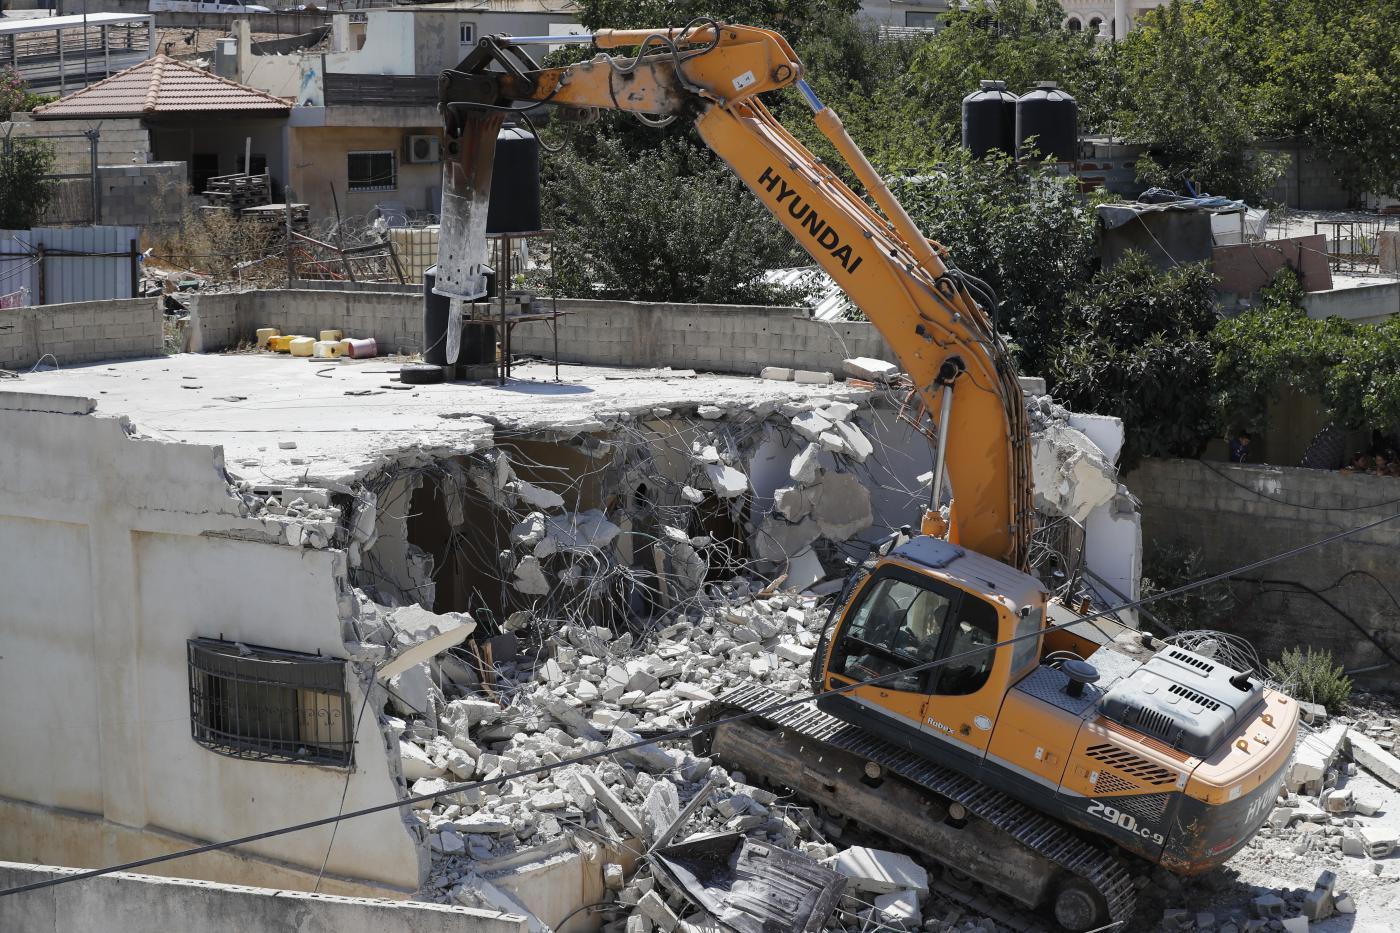 Israeli forces demolish Palestinian building in East Jerusalem